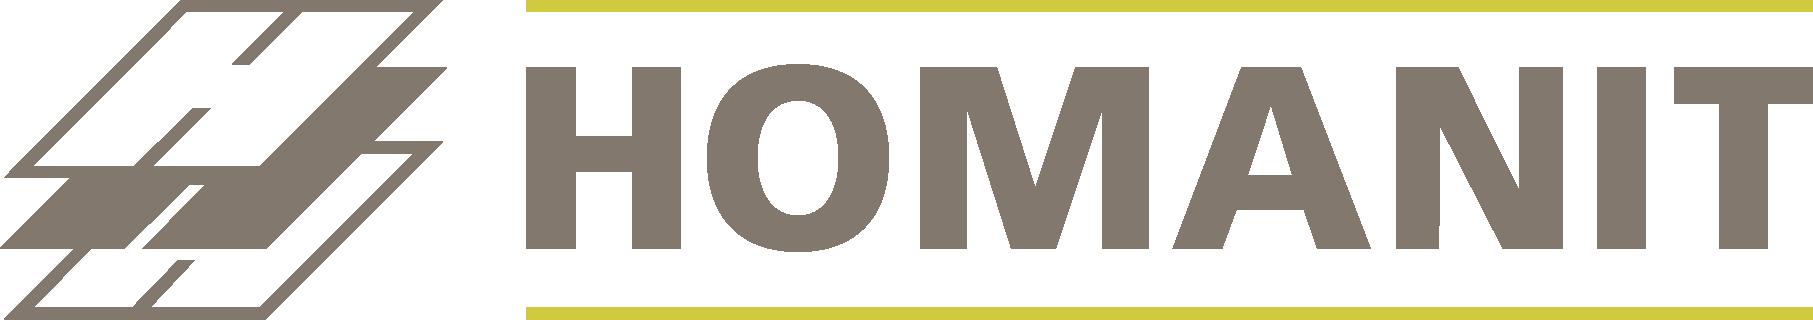 Homanit GmbH & Co. KG